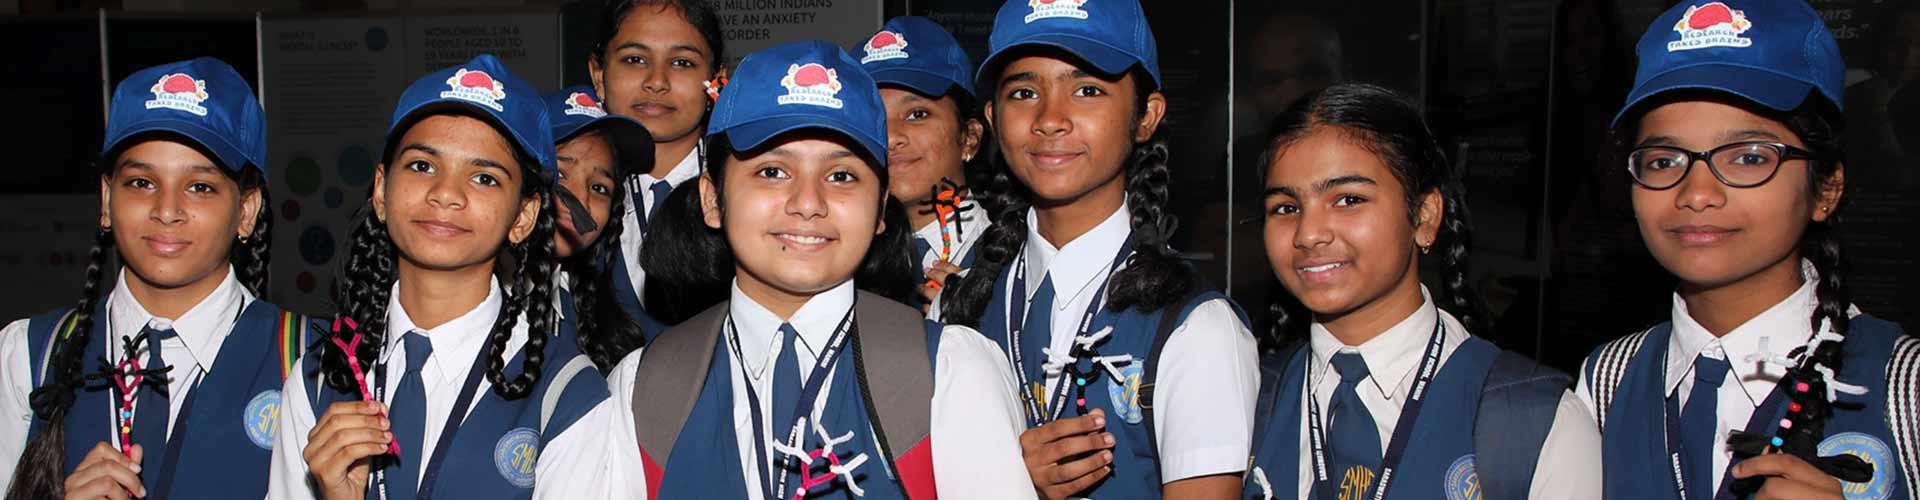 Students in Mumbai